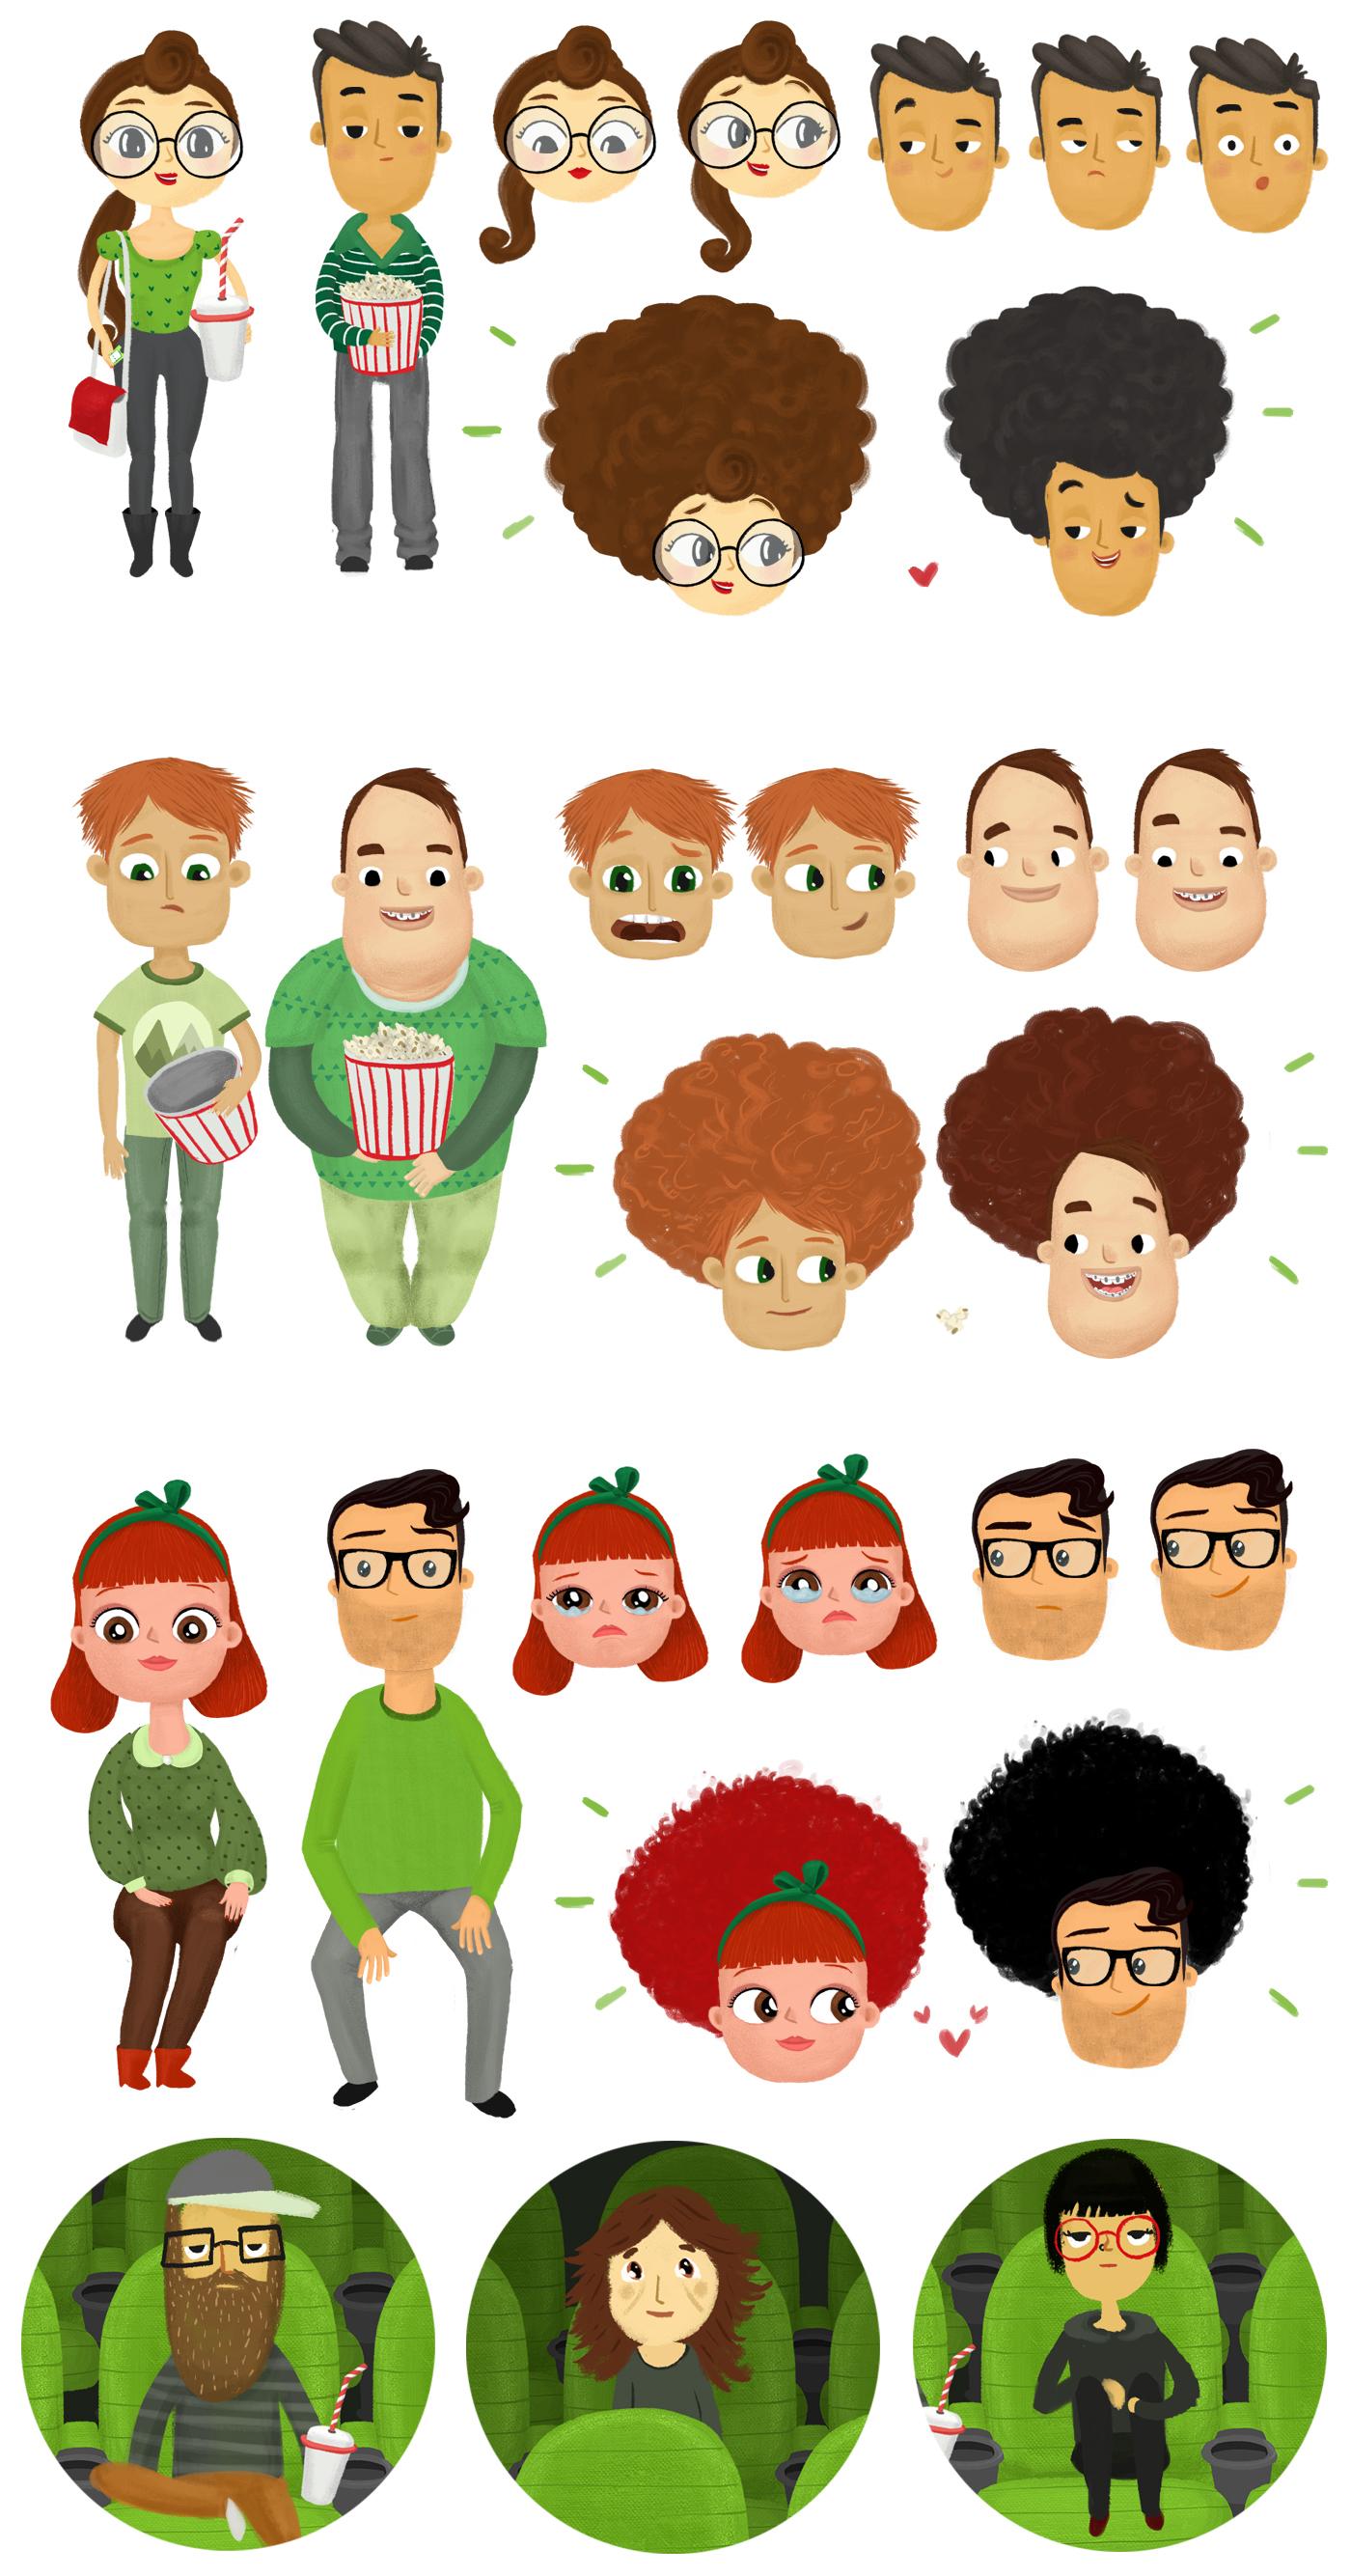 character animation Bonus Love Cinema movie theater garanti bonus 2D Animation popcorn